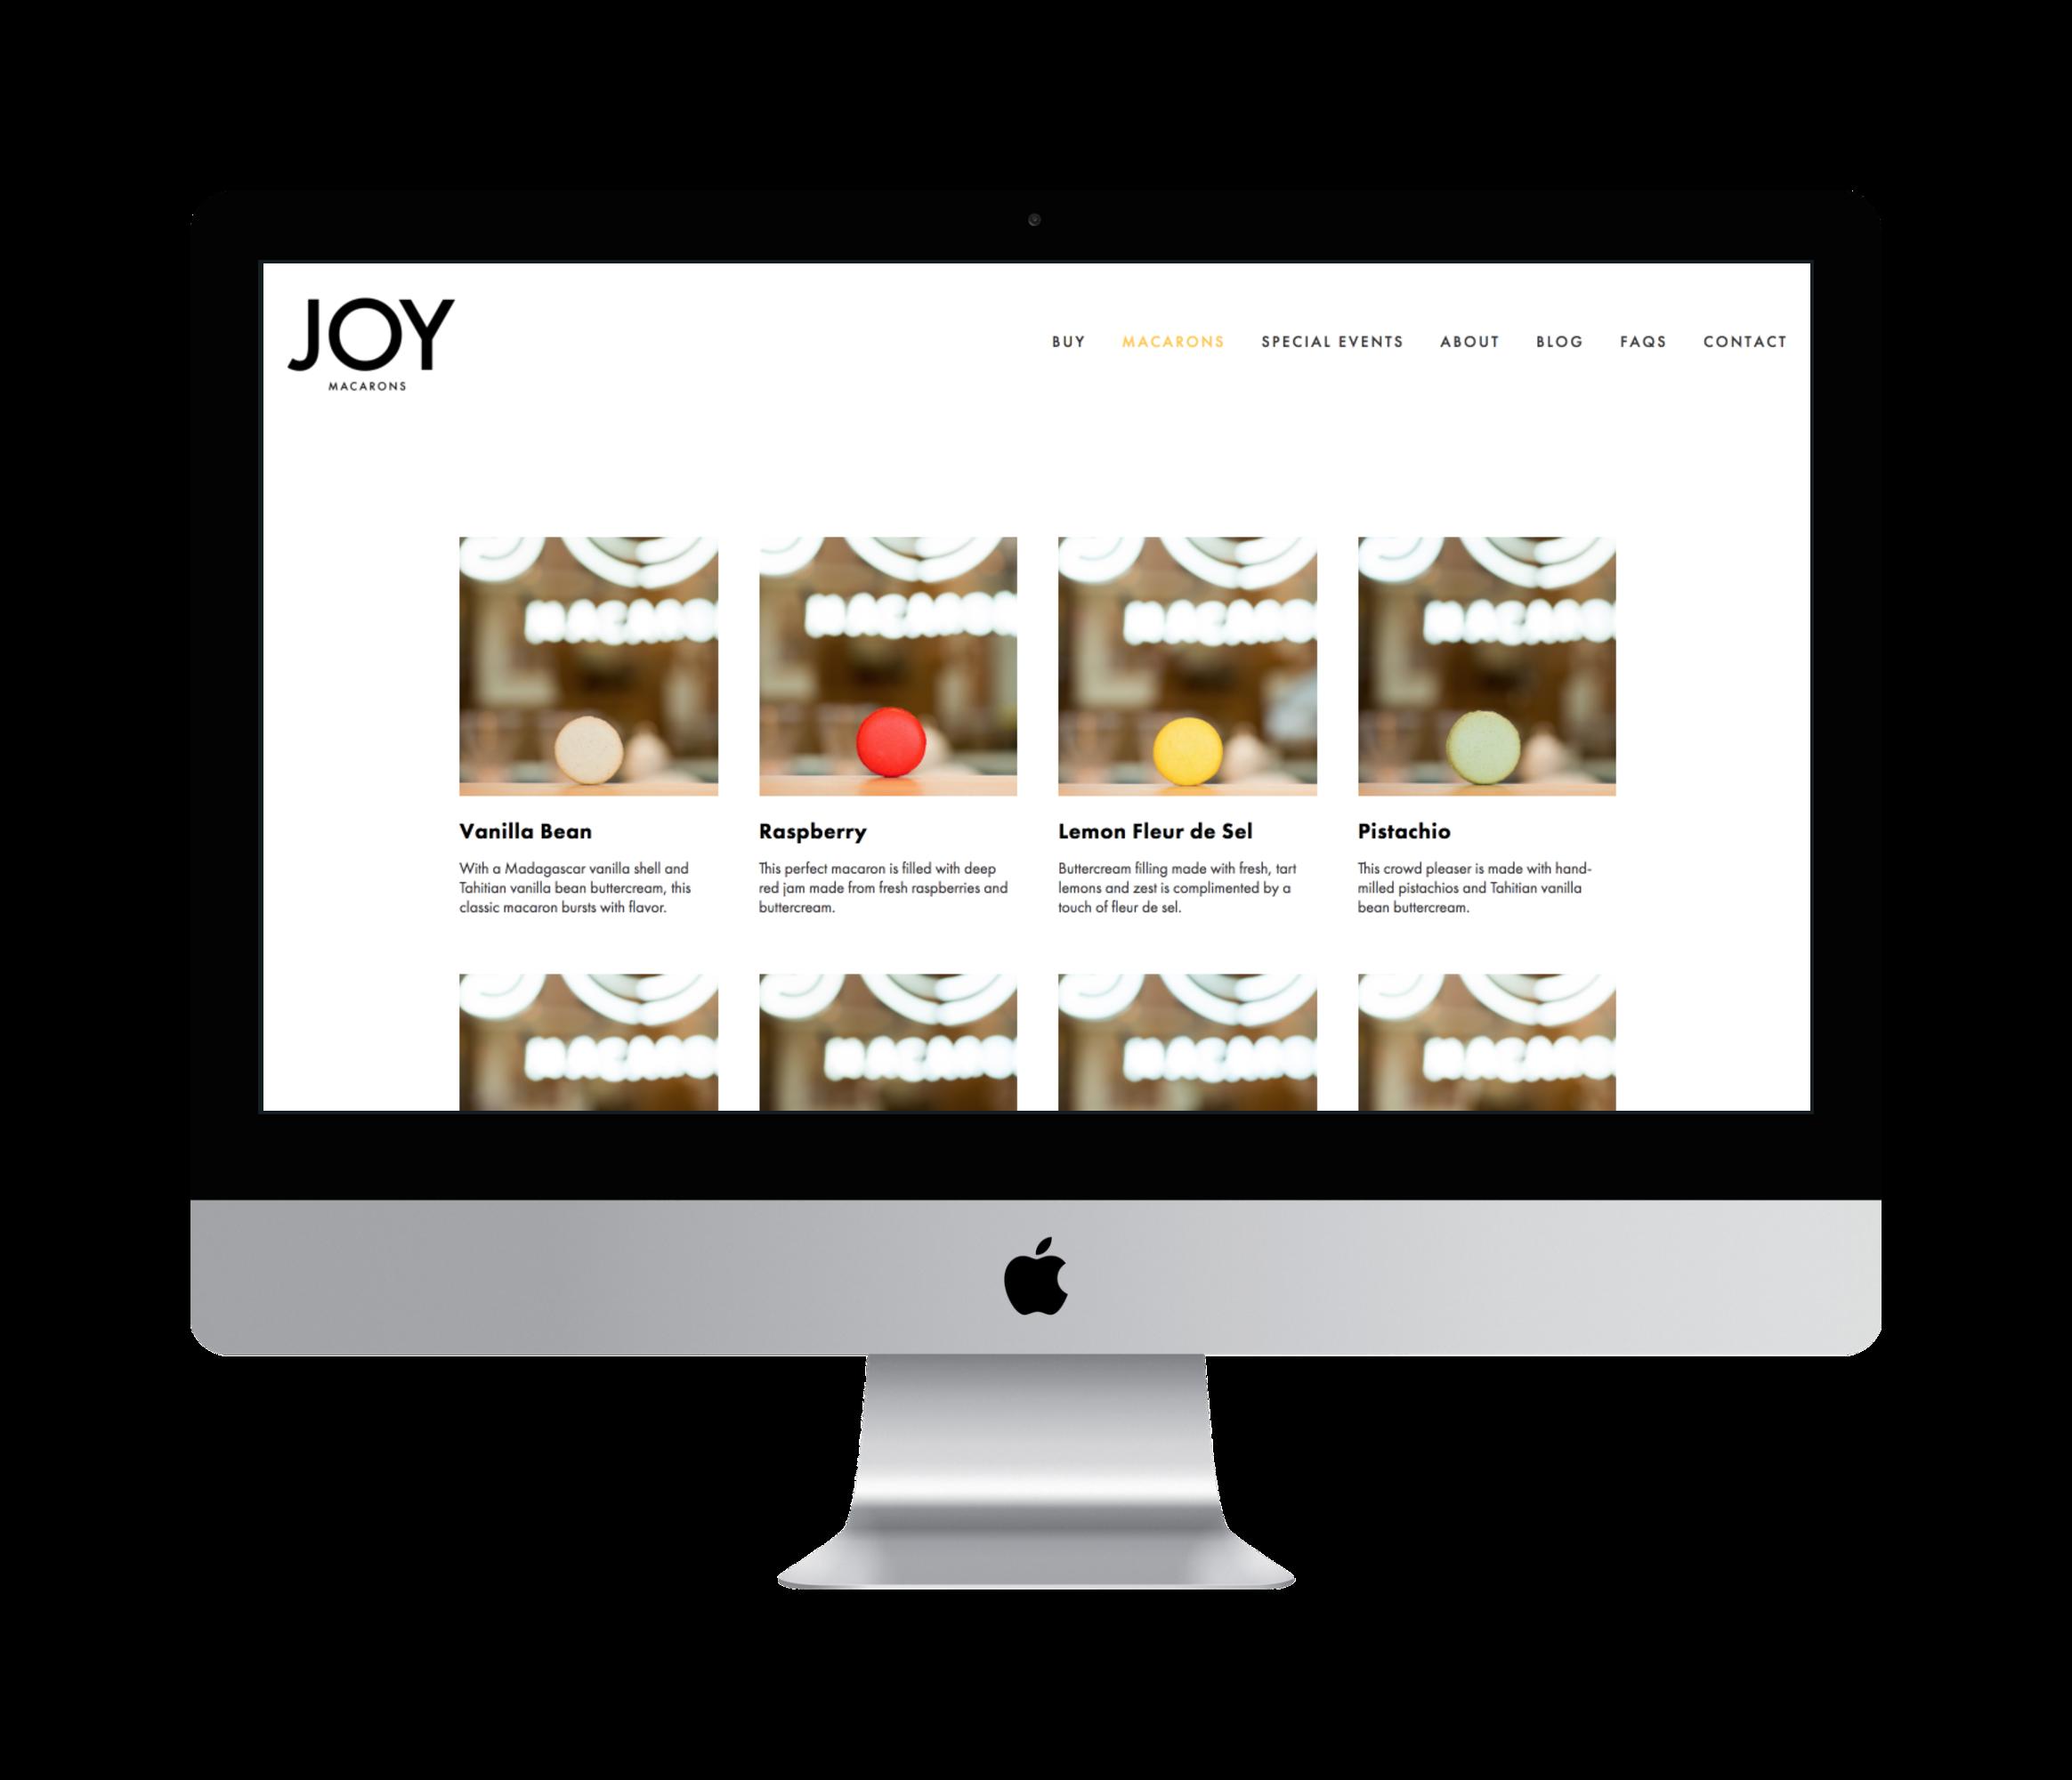 screenshot-www.joymacarons.com 2017-08-09 11-33-37-iMac.png